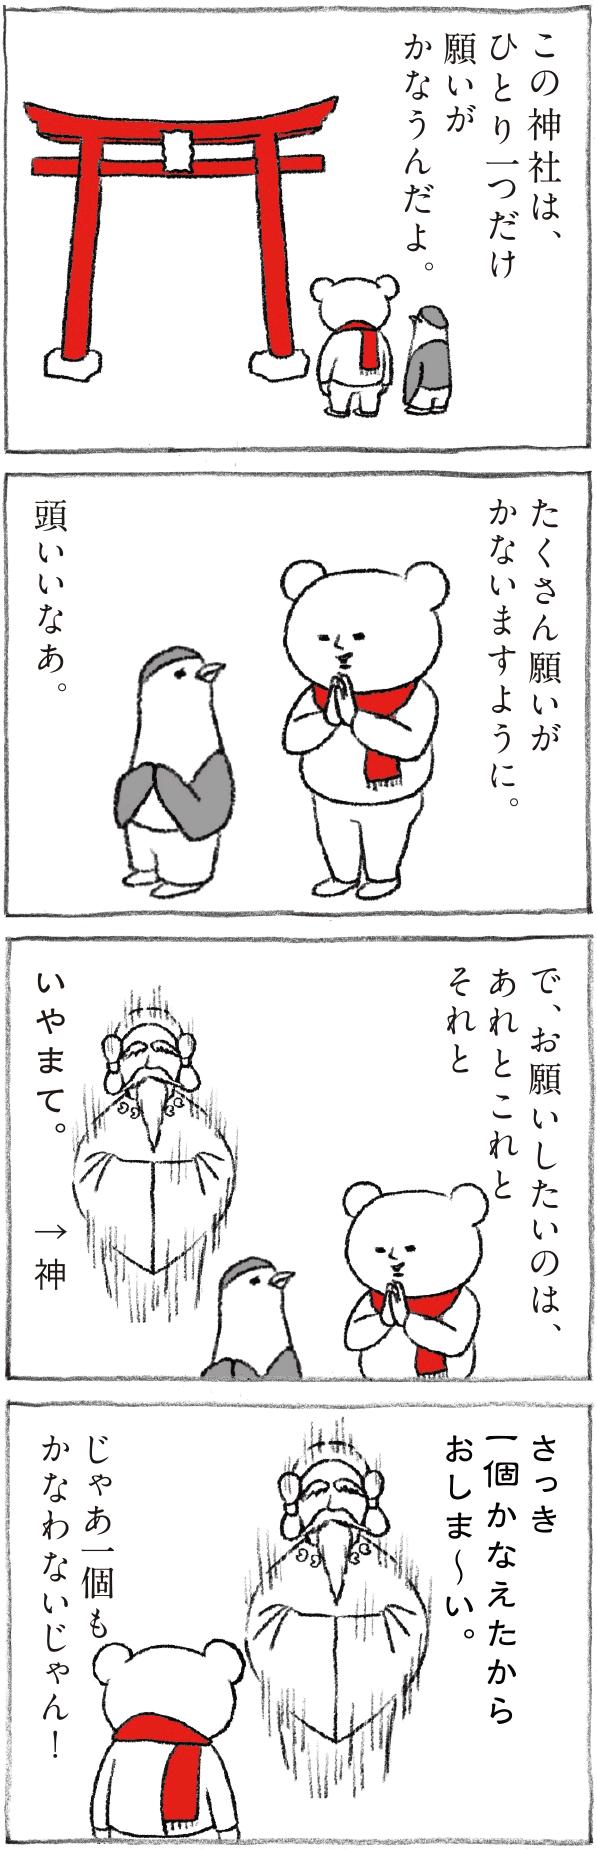 Hanako 1191号:おかわり自由